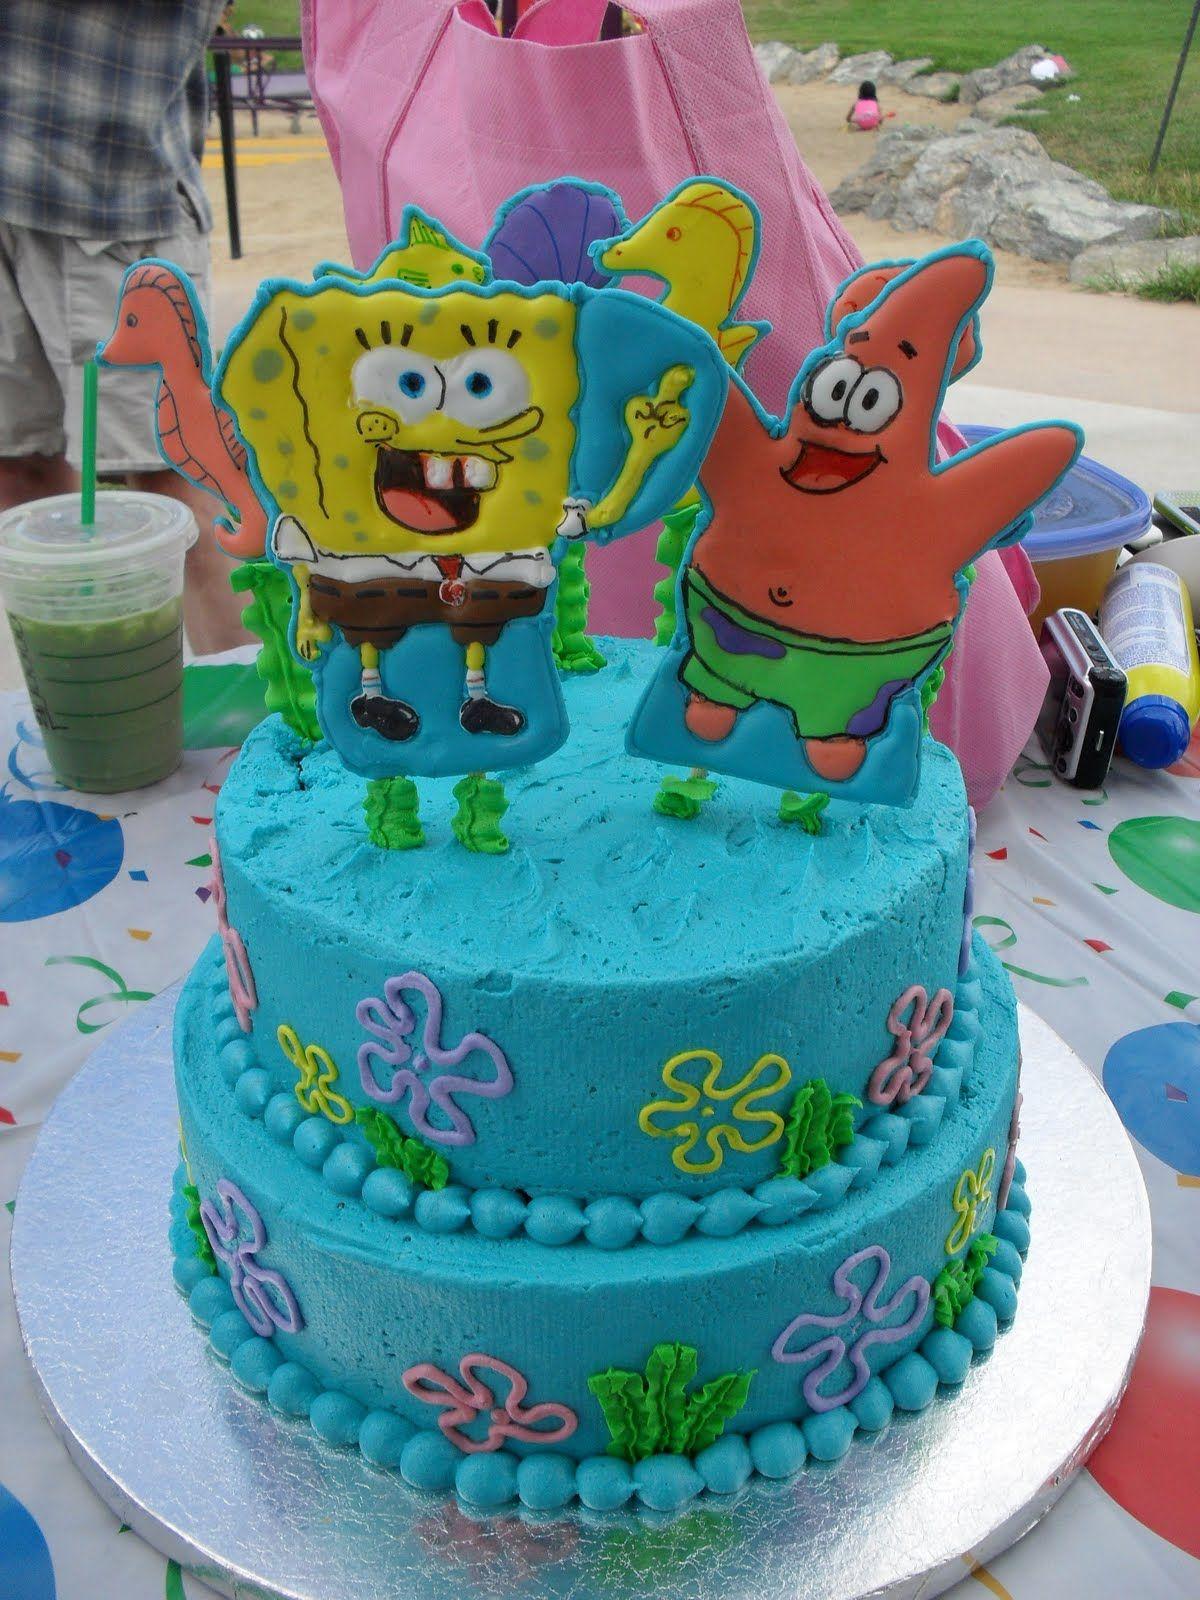 Spongebob Squarepants Cakes Behold The Spongebob